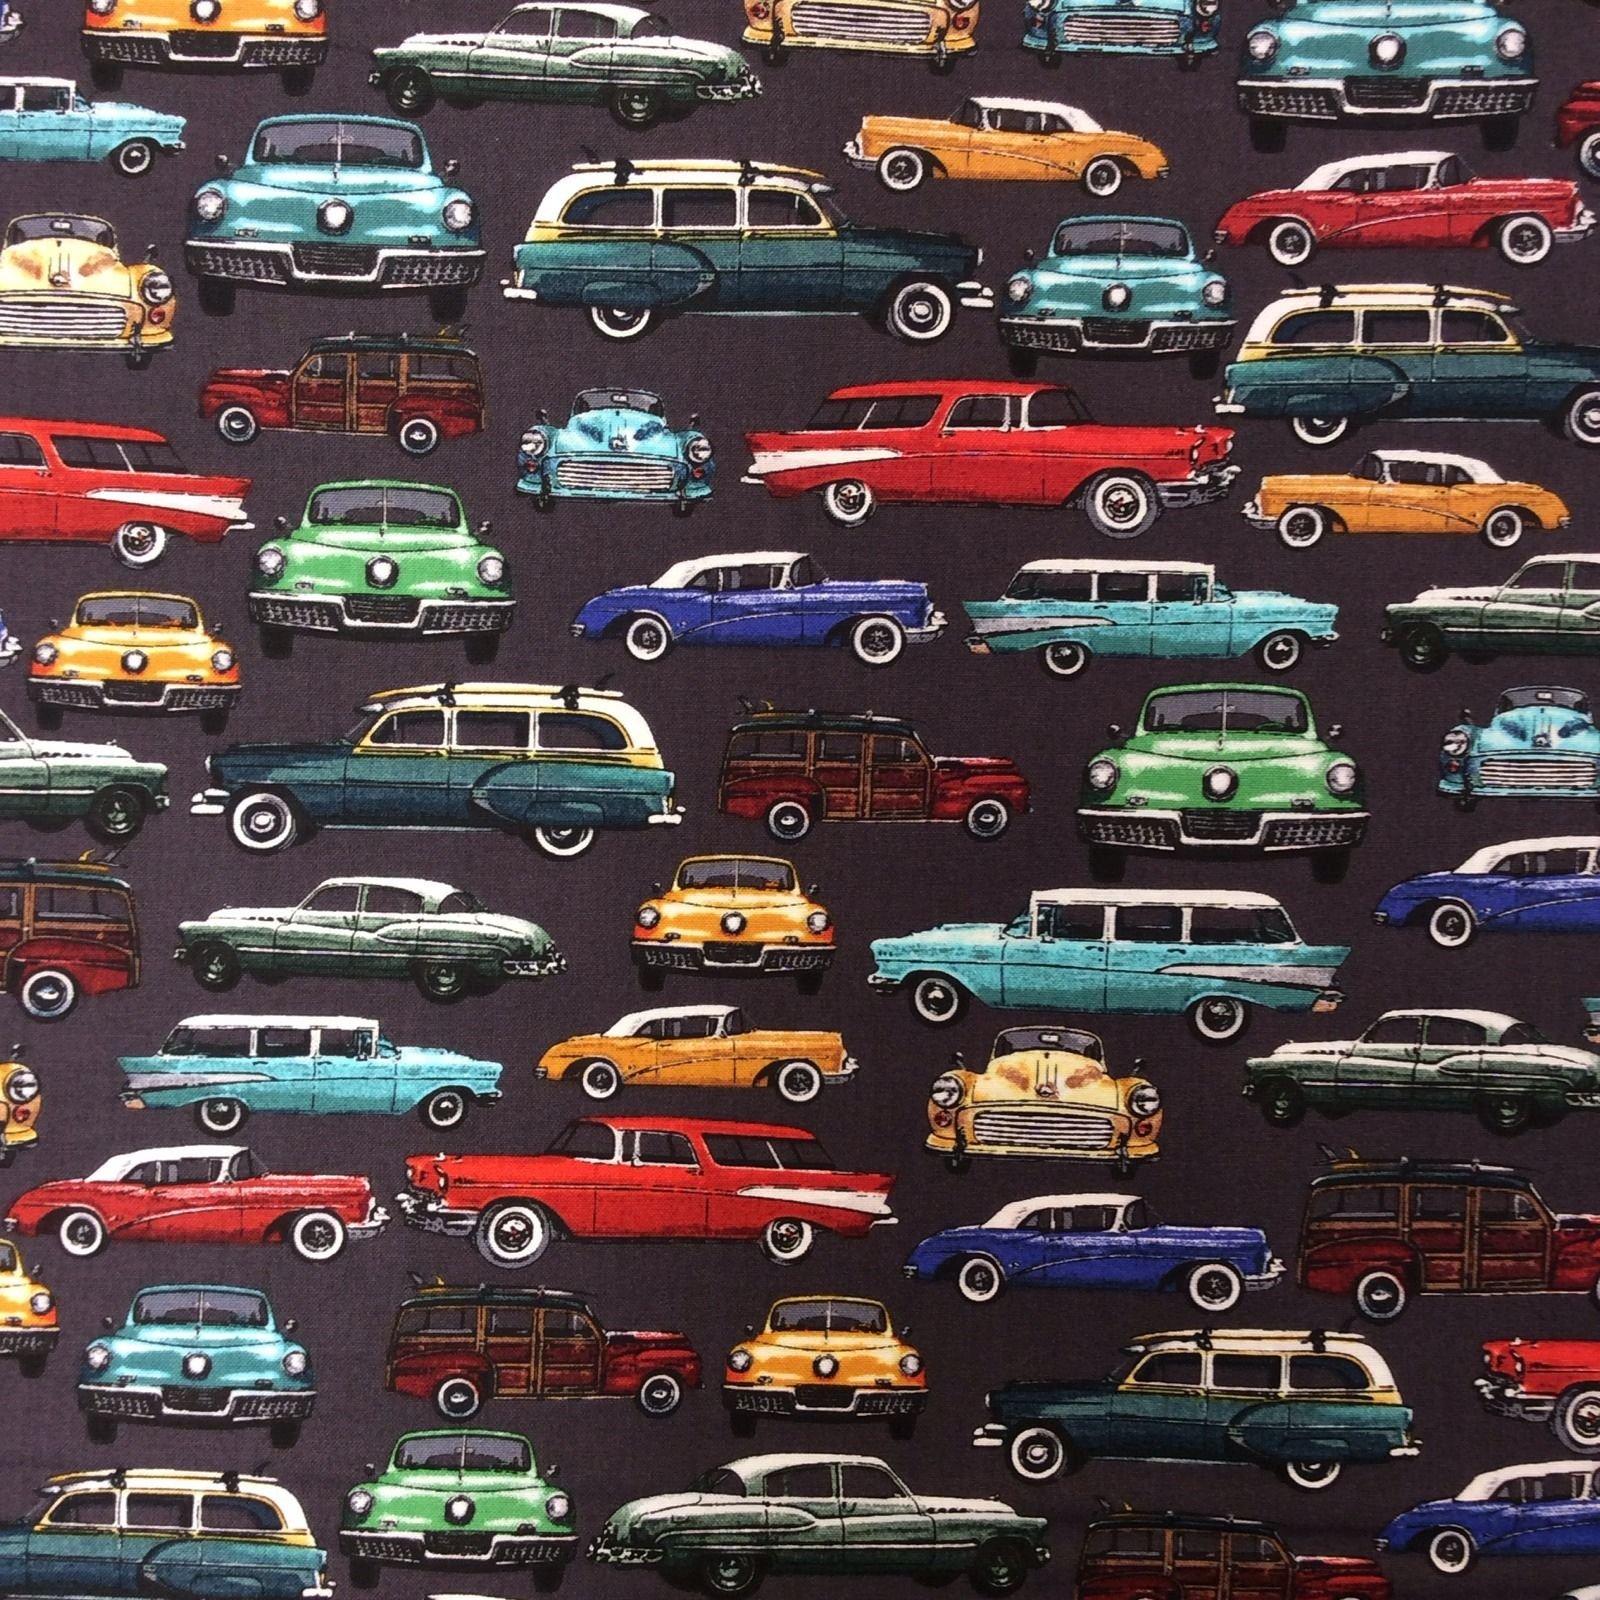 Cars Woody Wagon Station Wagon Coupe Hot Rods Sedan